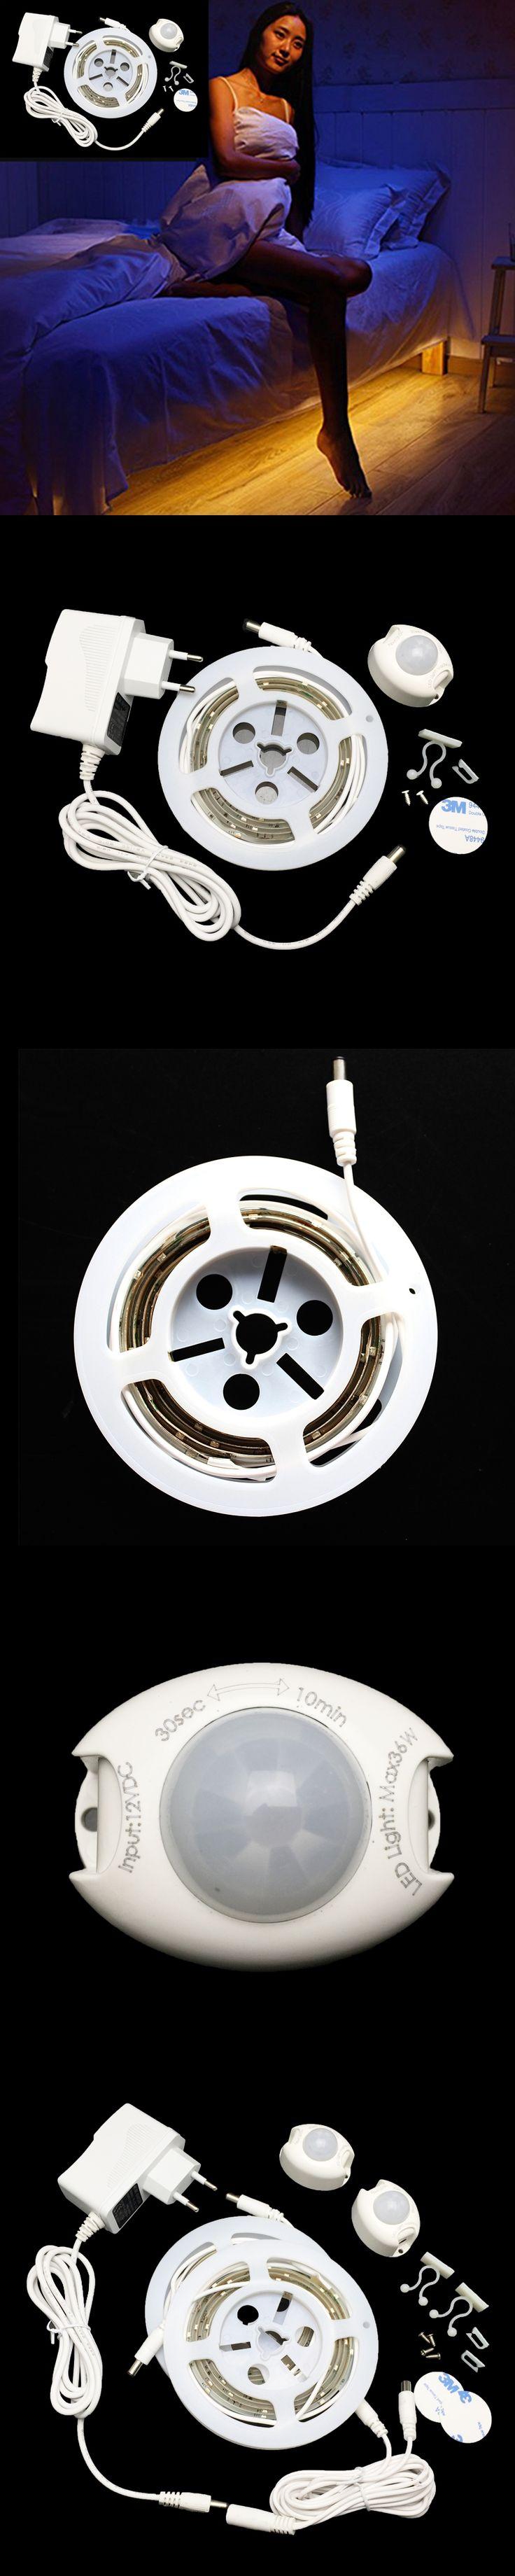 Intelligent Turn ON/OFF Human Infrared Sensor LED Strip Light Warm White 3000K Waterproof SMD2835 Strip Lighting For Bedroom